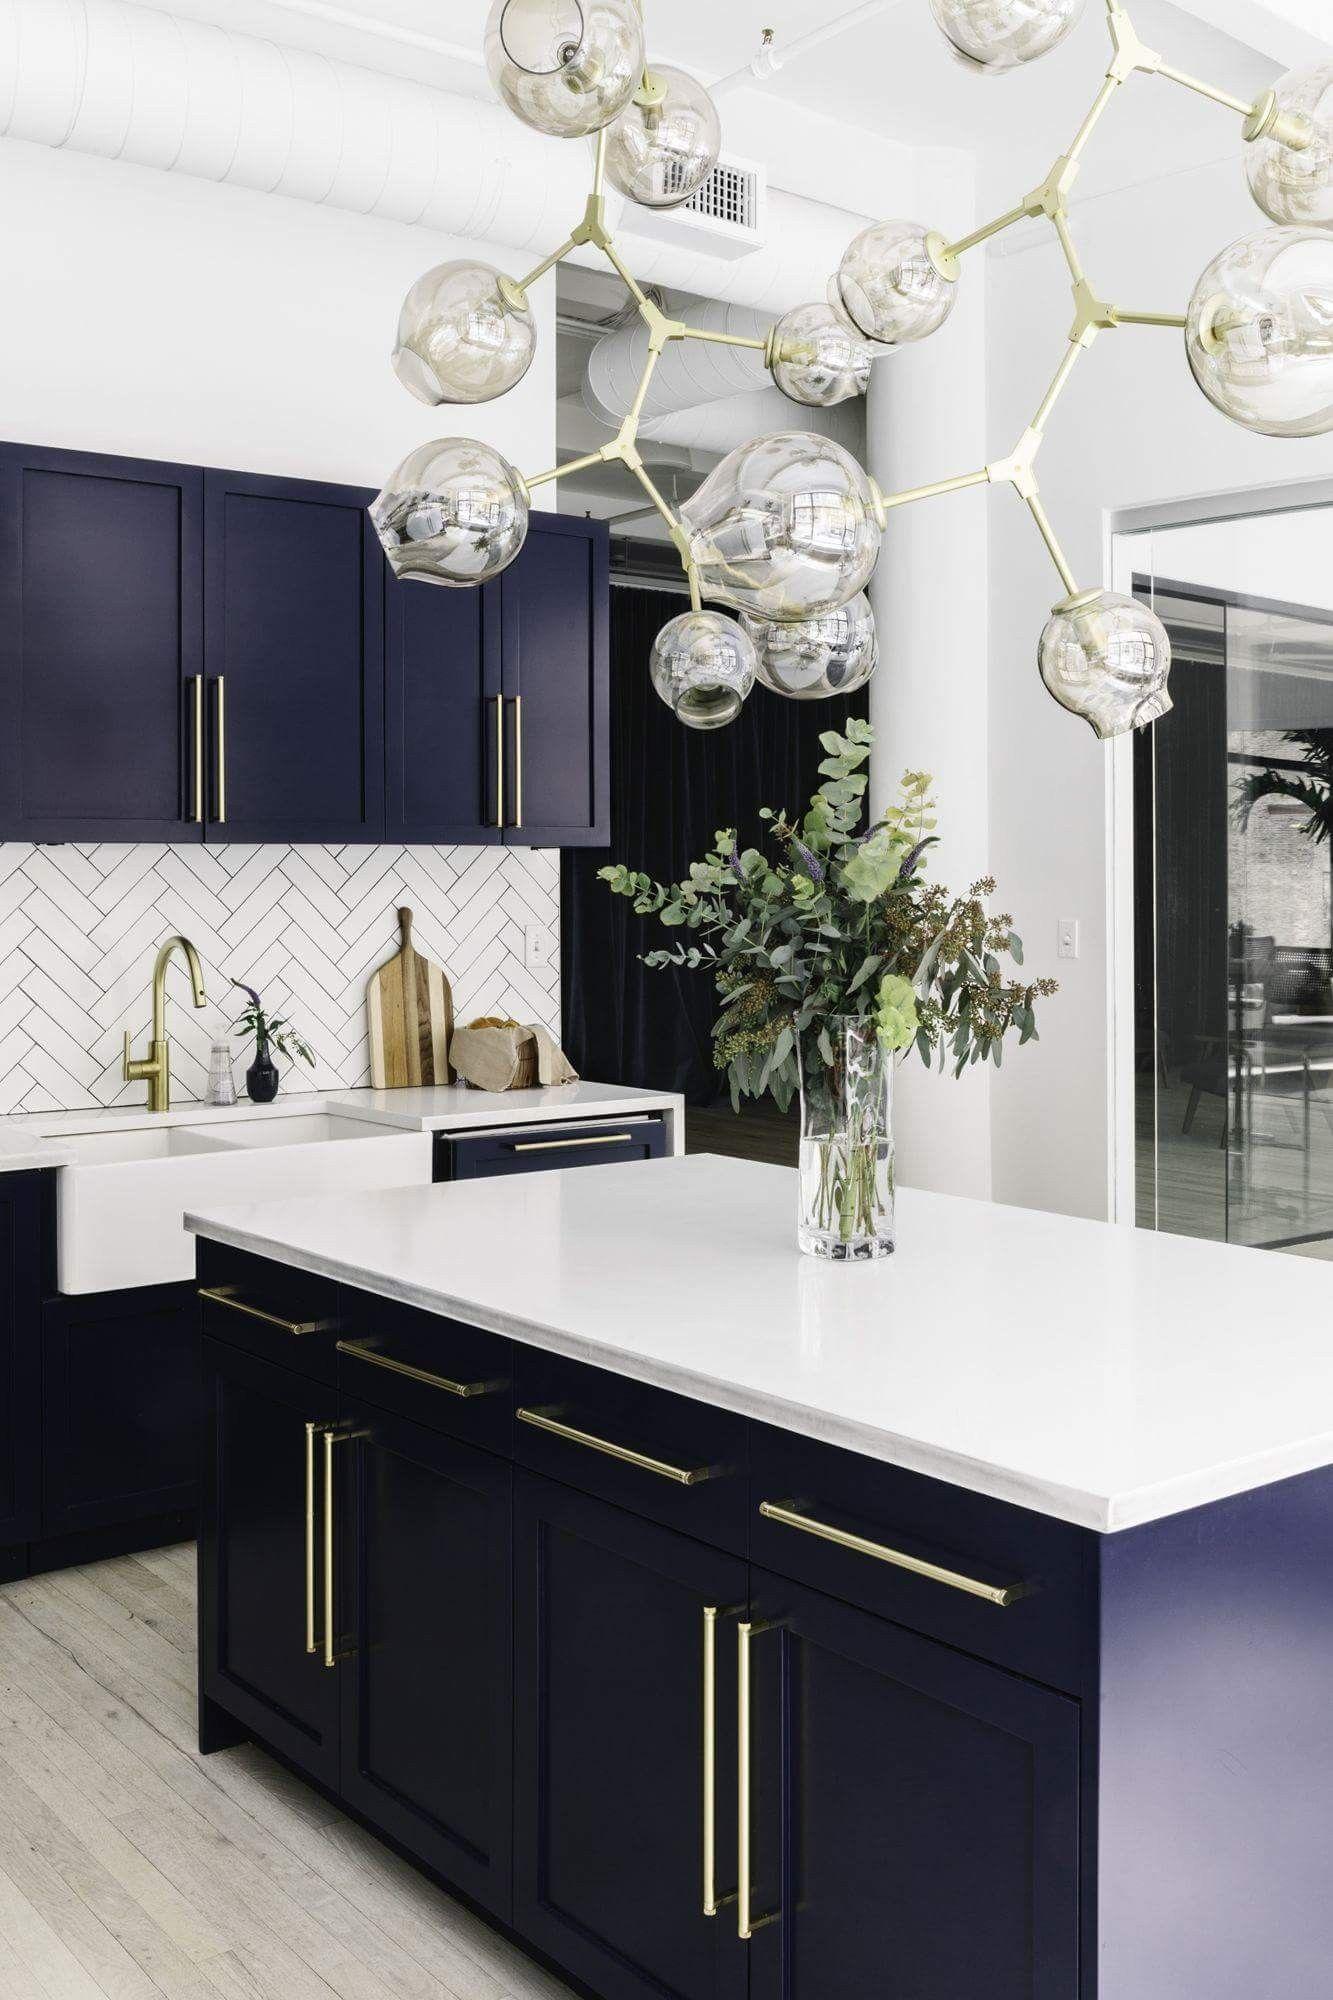 highlight lighting. Whole Kitchen Is Flip Gorgeous But That Light Definitely The Highlight ✨ Lighting G